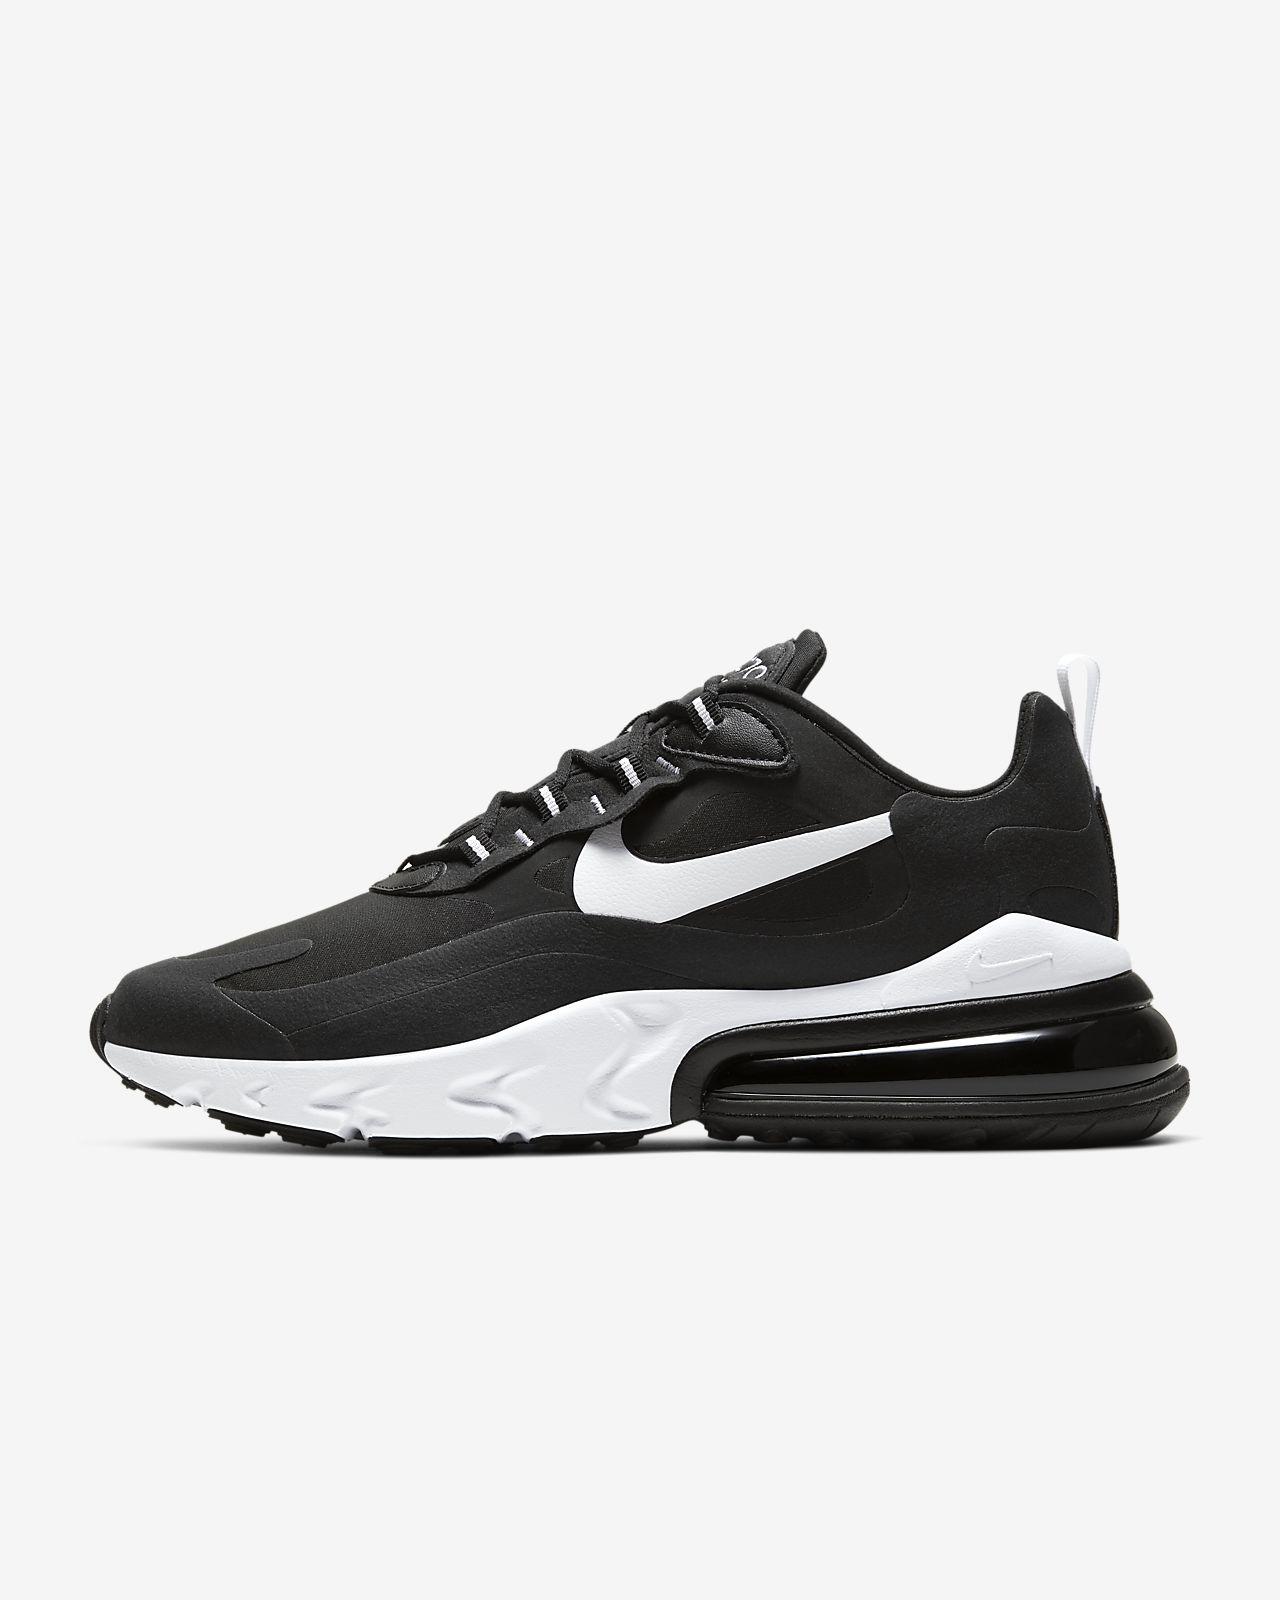 Chaussure Nike Air Max 270 React pour Homme